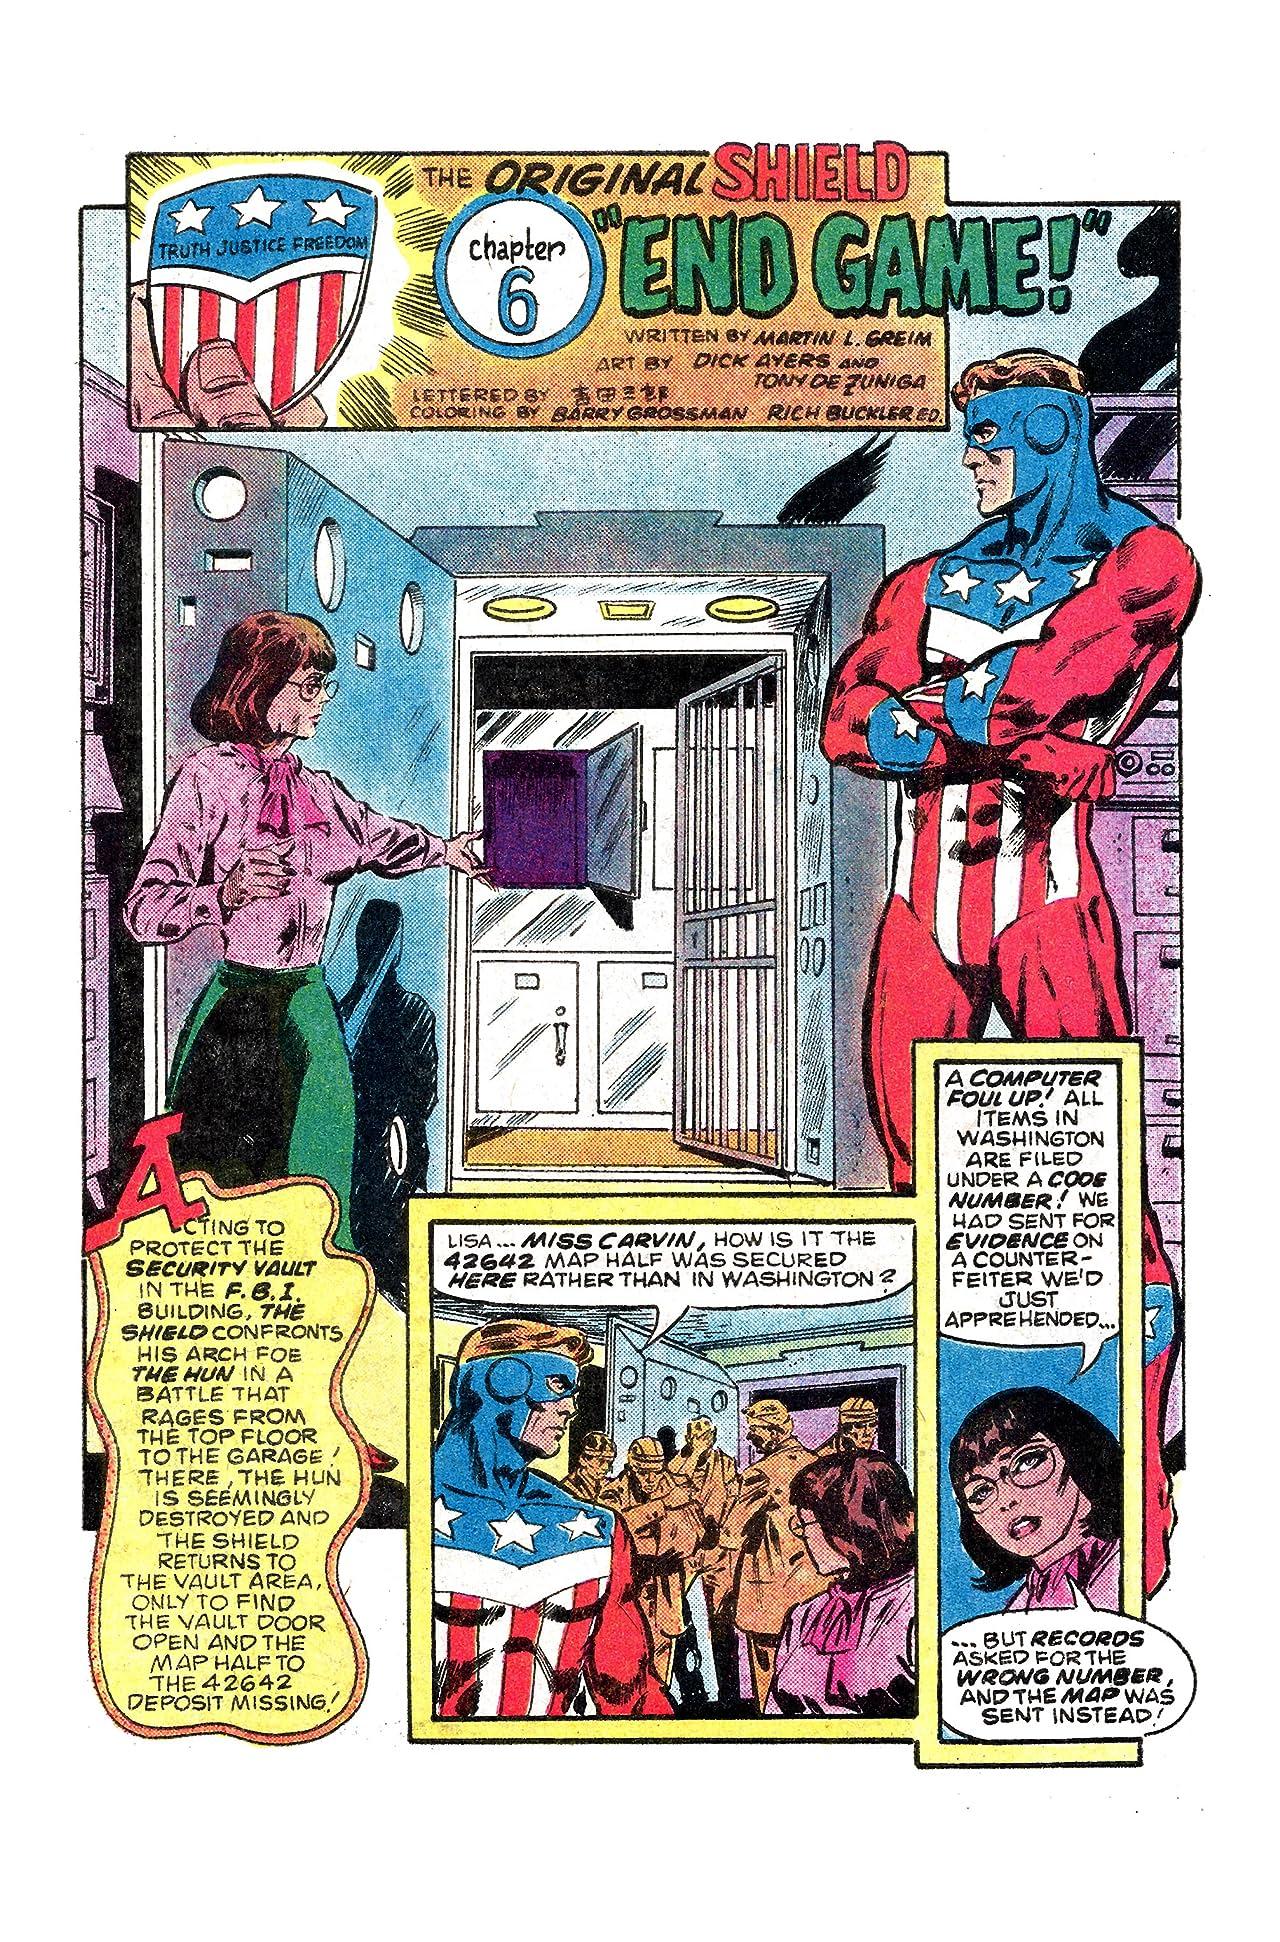 The Original Shield (Red Circle Comics) #1